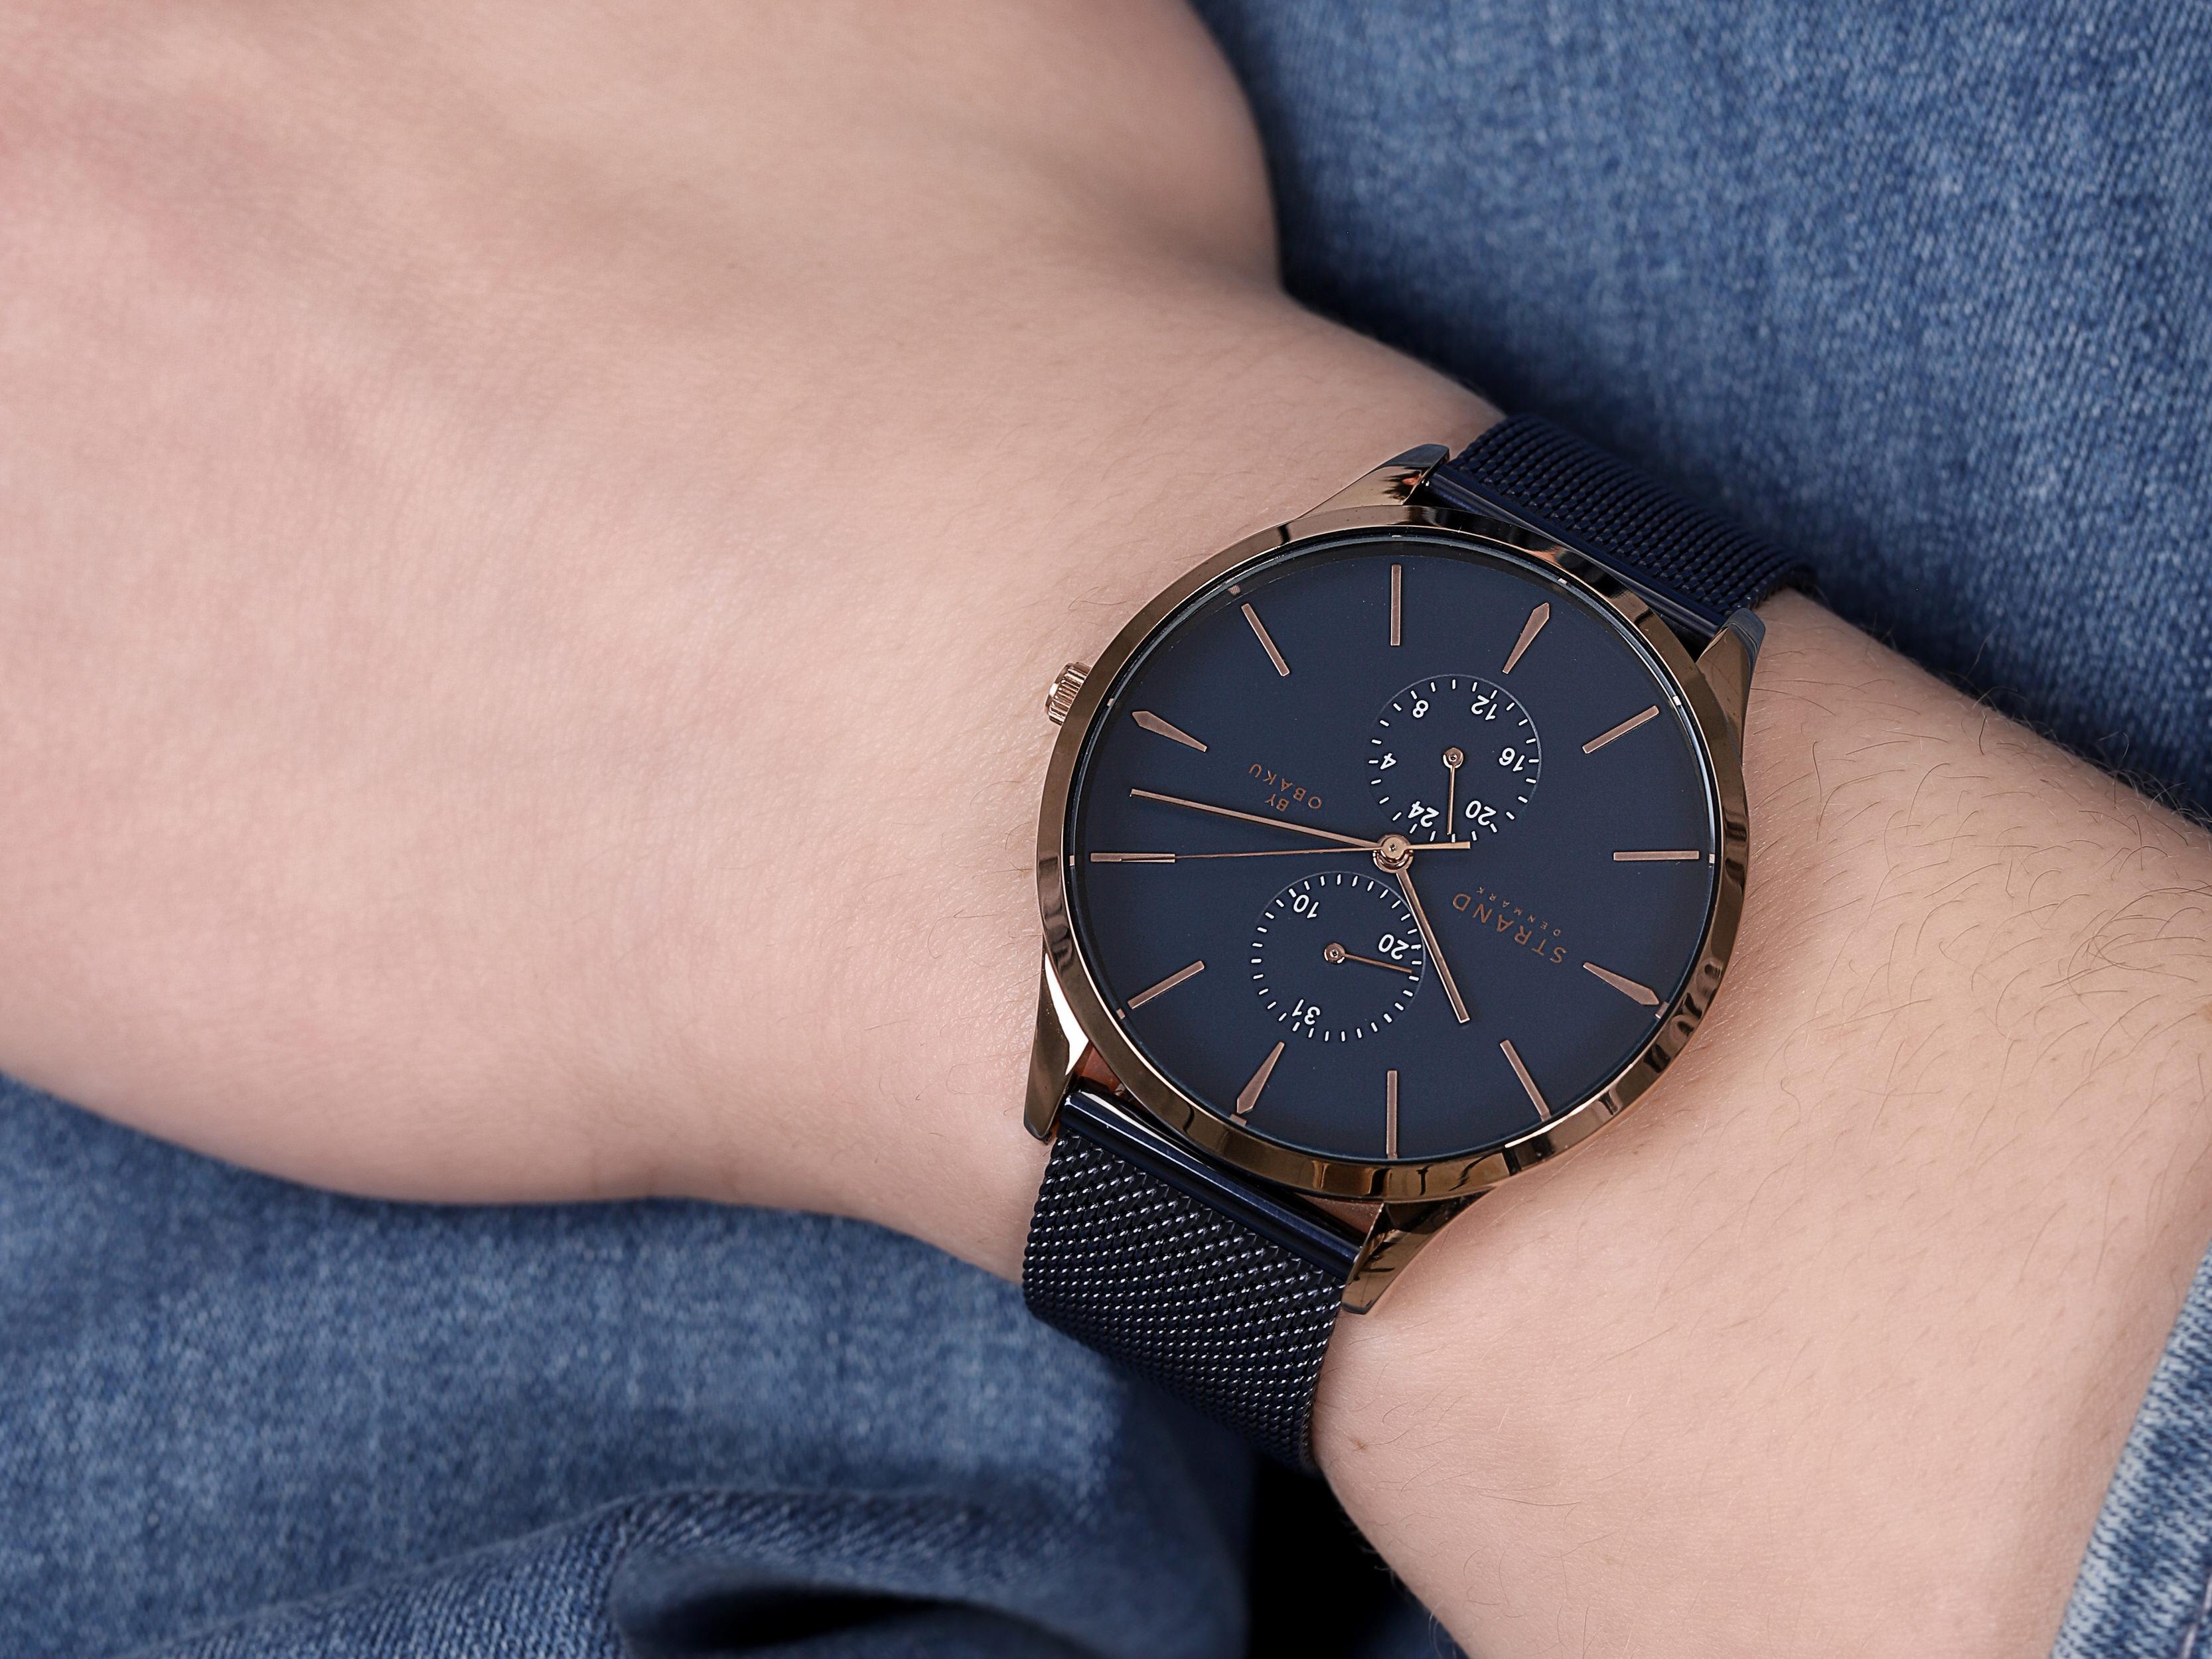 Strand S703GMVLML Beaufort zegarek męski klasyczny mineralne